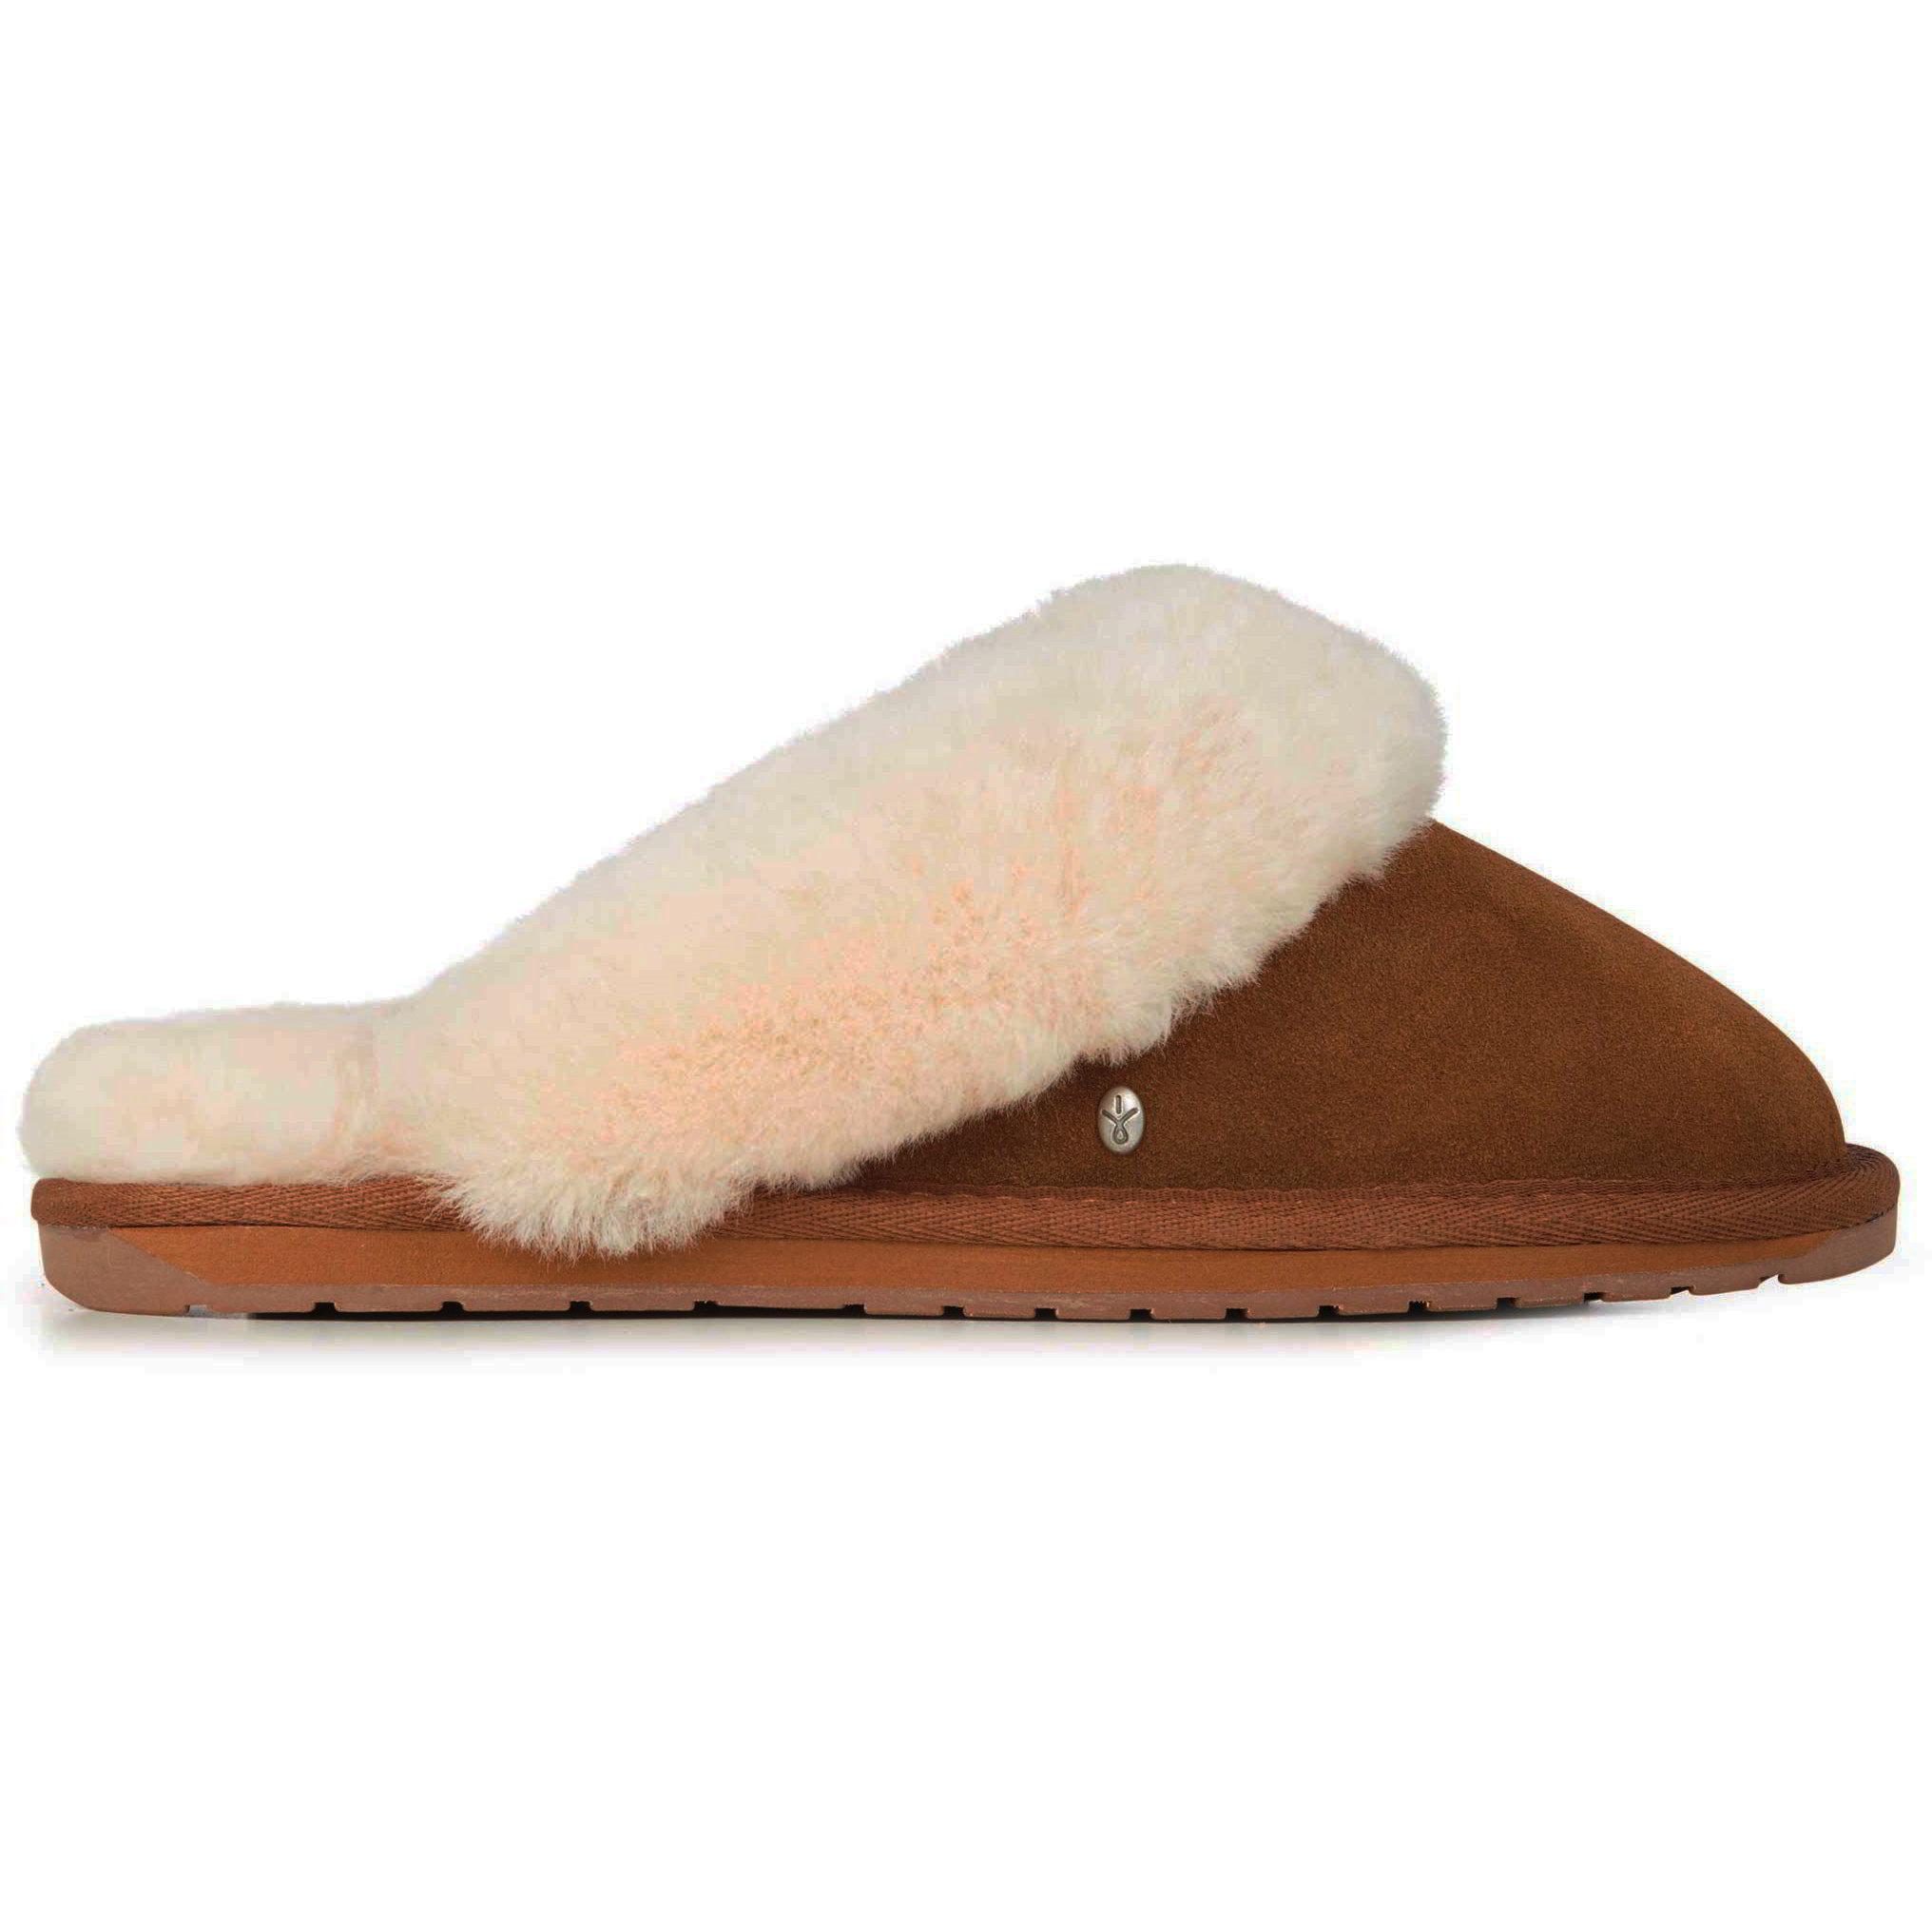 EMU Australia Womens Jolie Sheepskin Slippers - Chestnut